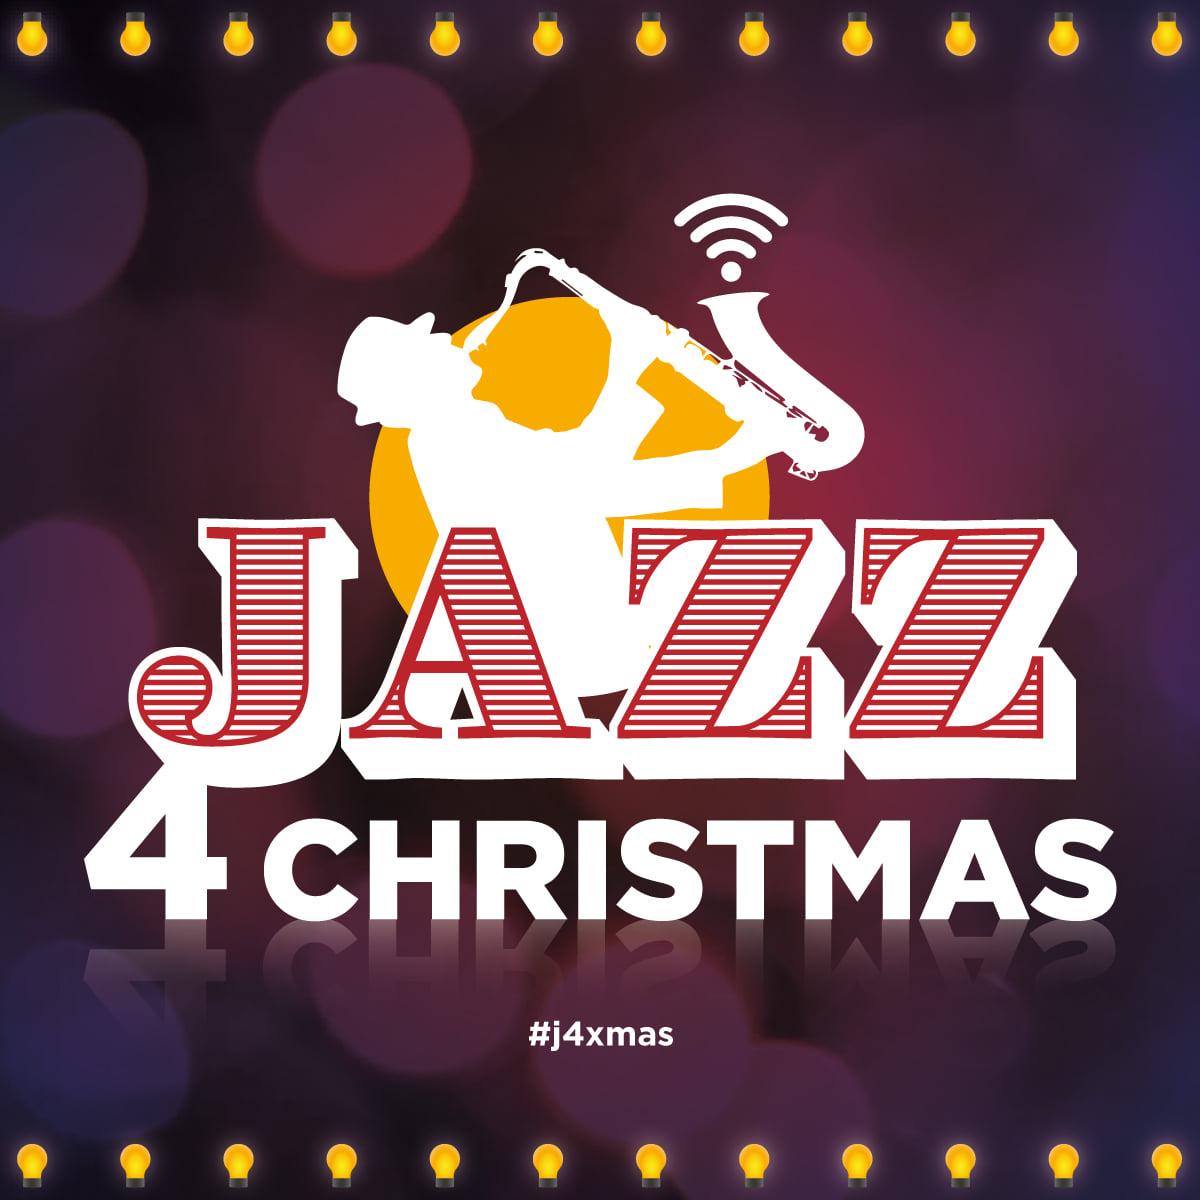 Jazz4Christmas Lifeblogger.it